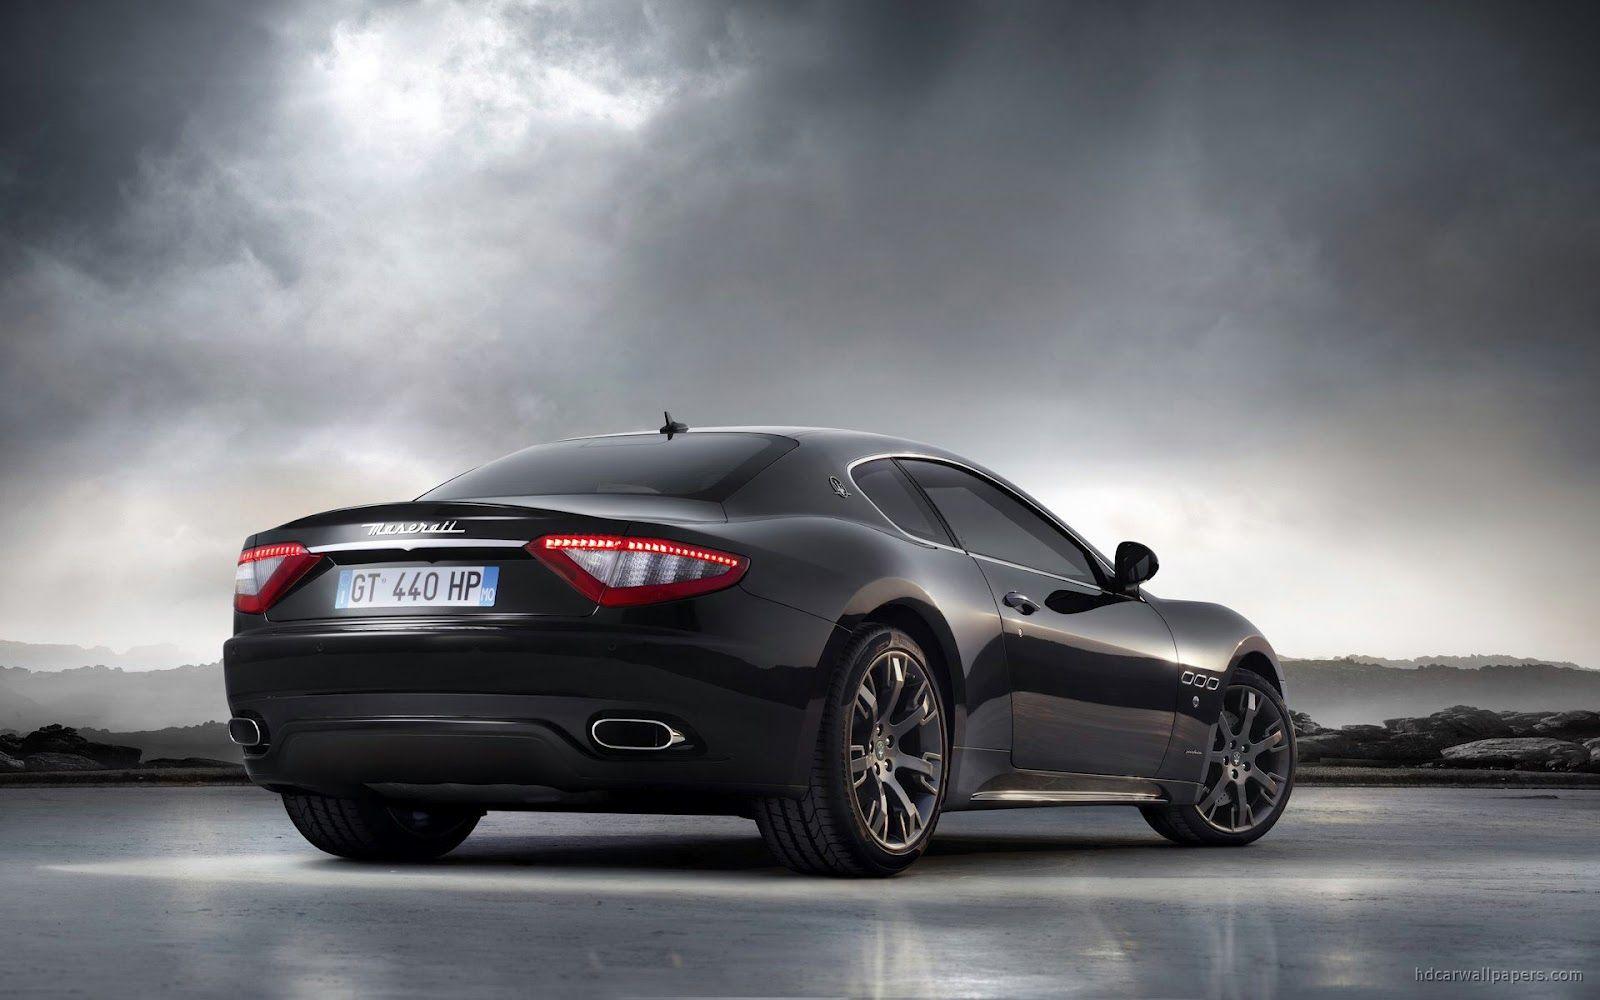 Best Hd Car Wallpapers High Definition Quality Backgrounds Maserati Granturismo Maserati Car Maserati Granturismo S